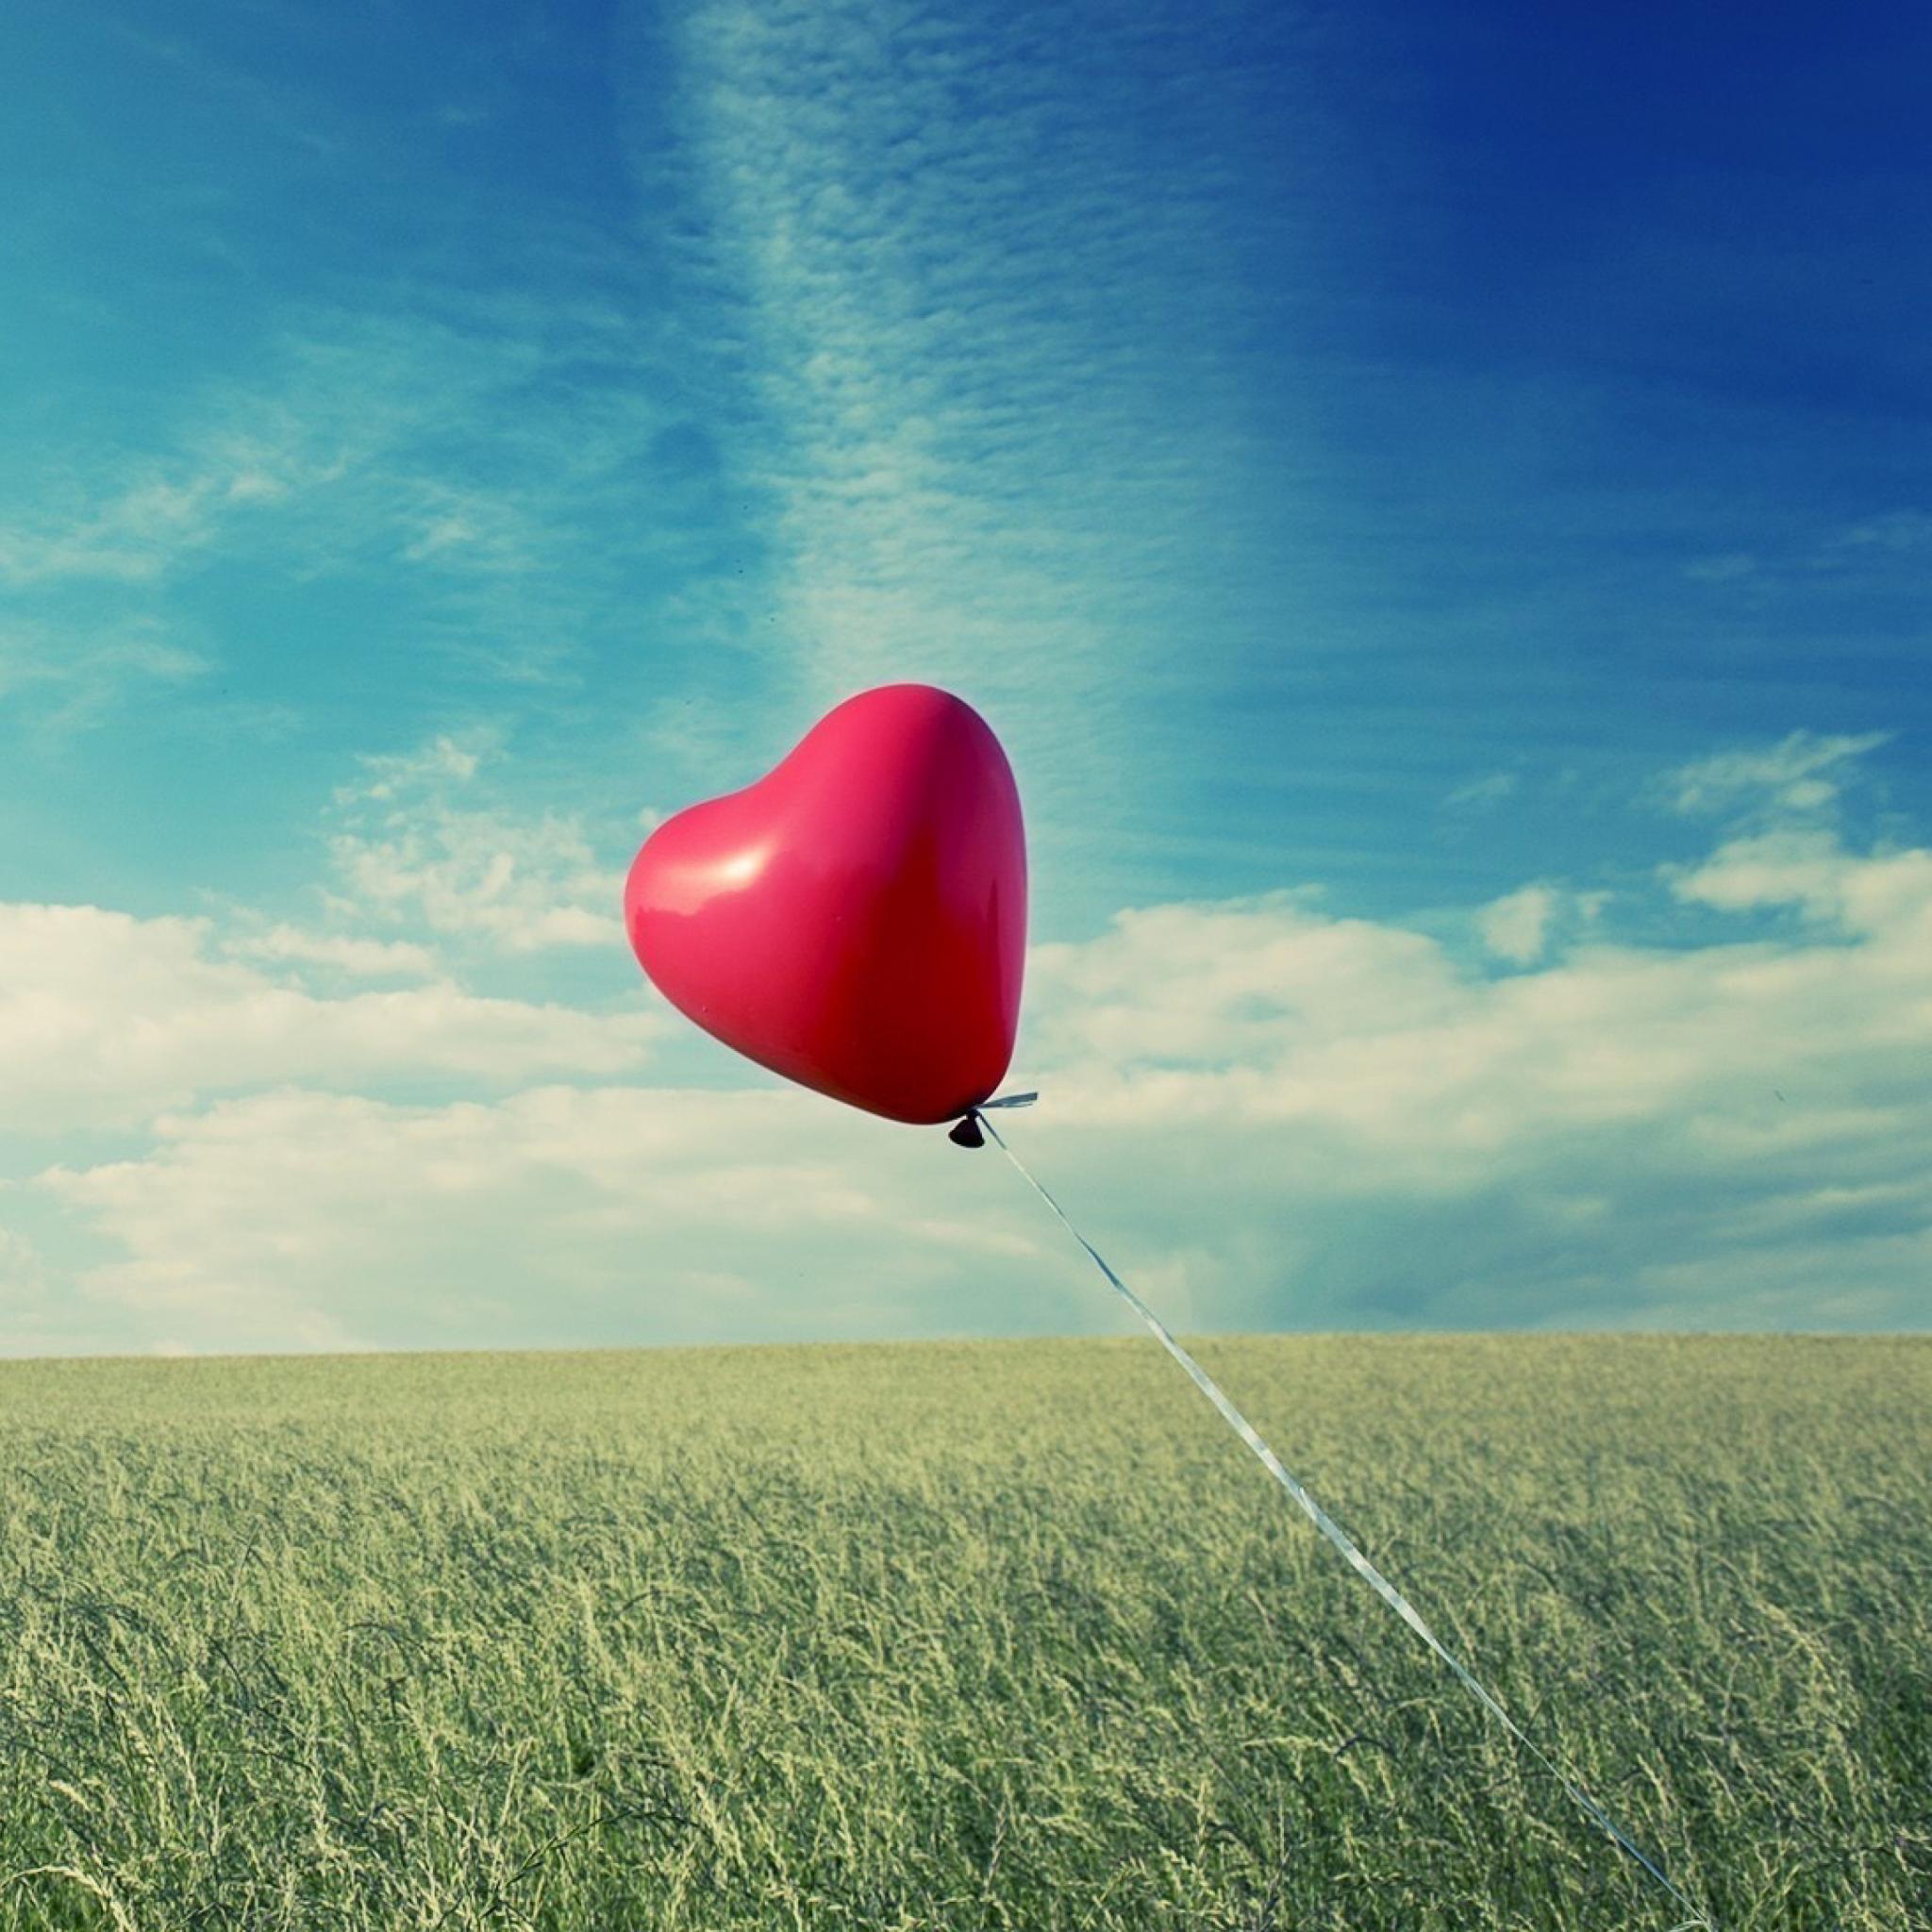 Сердце из зелени  № 1599063 без смс